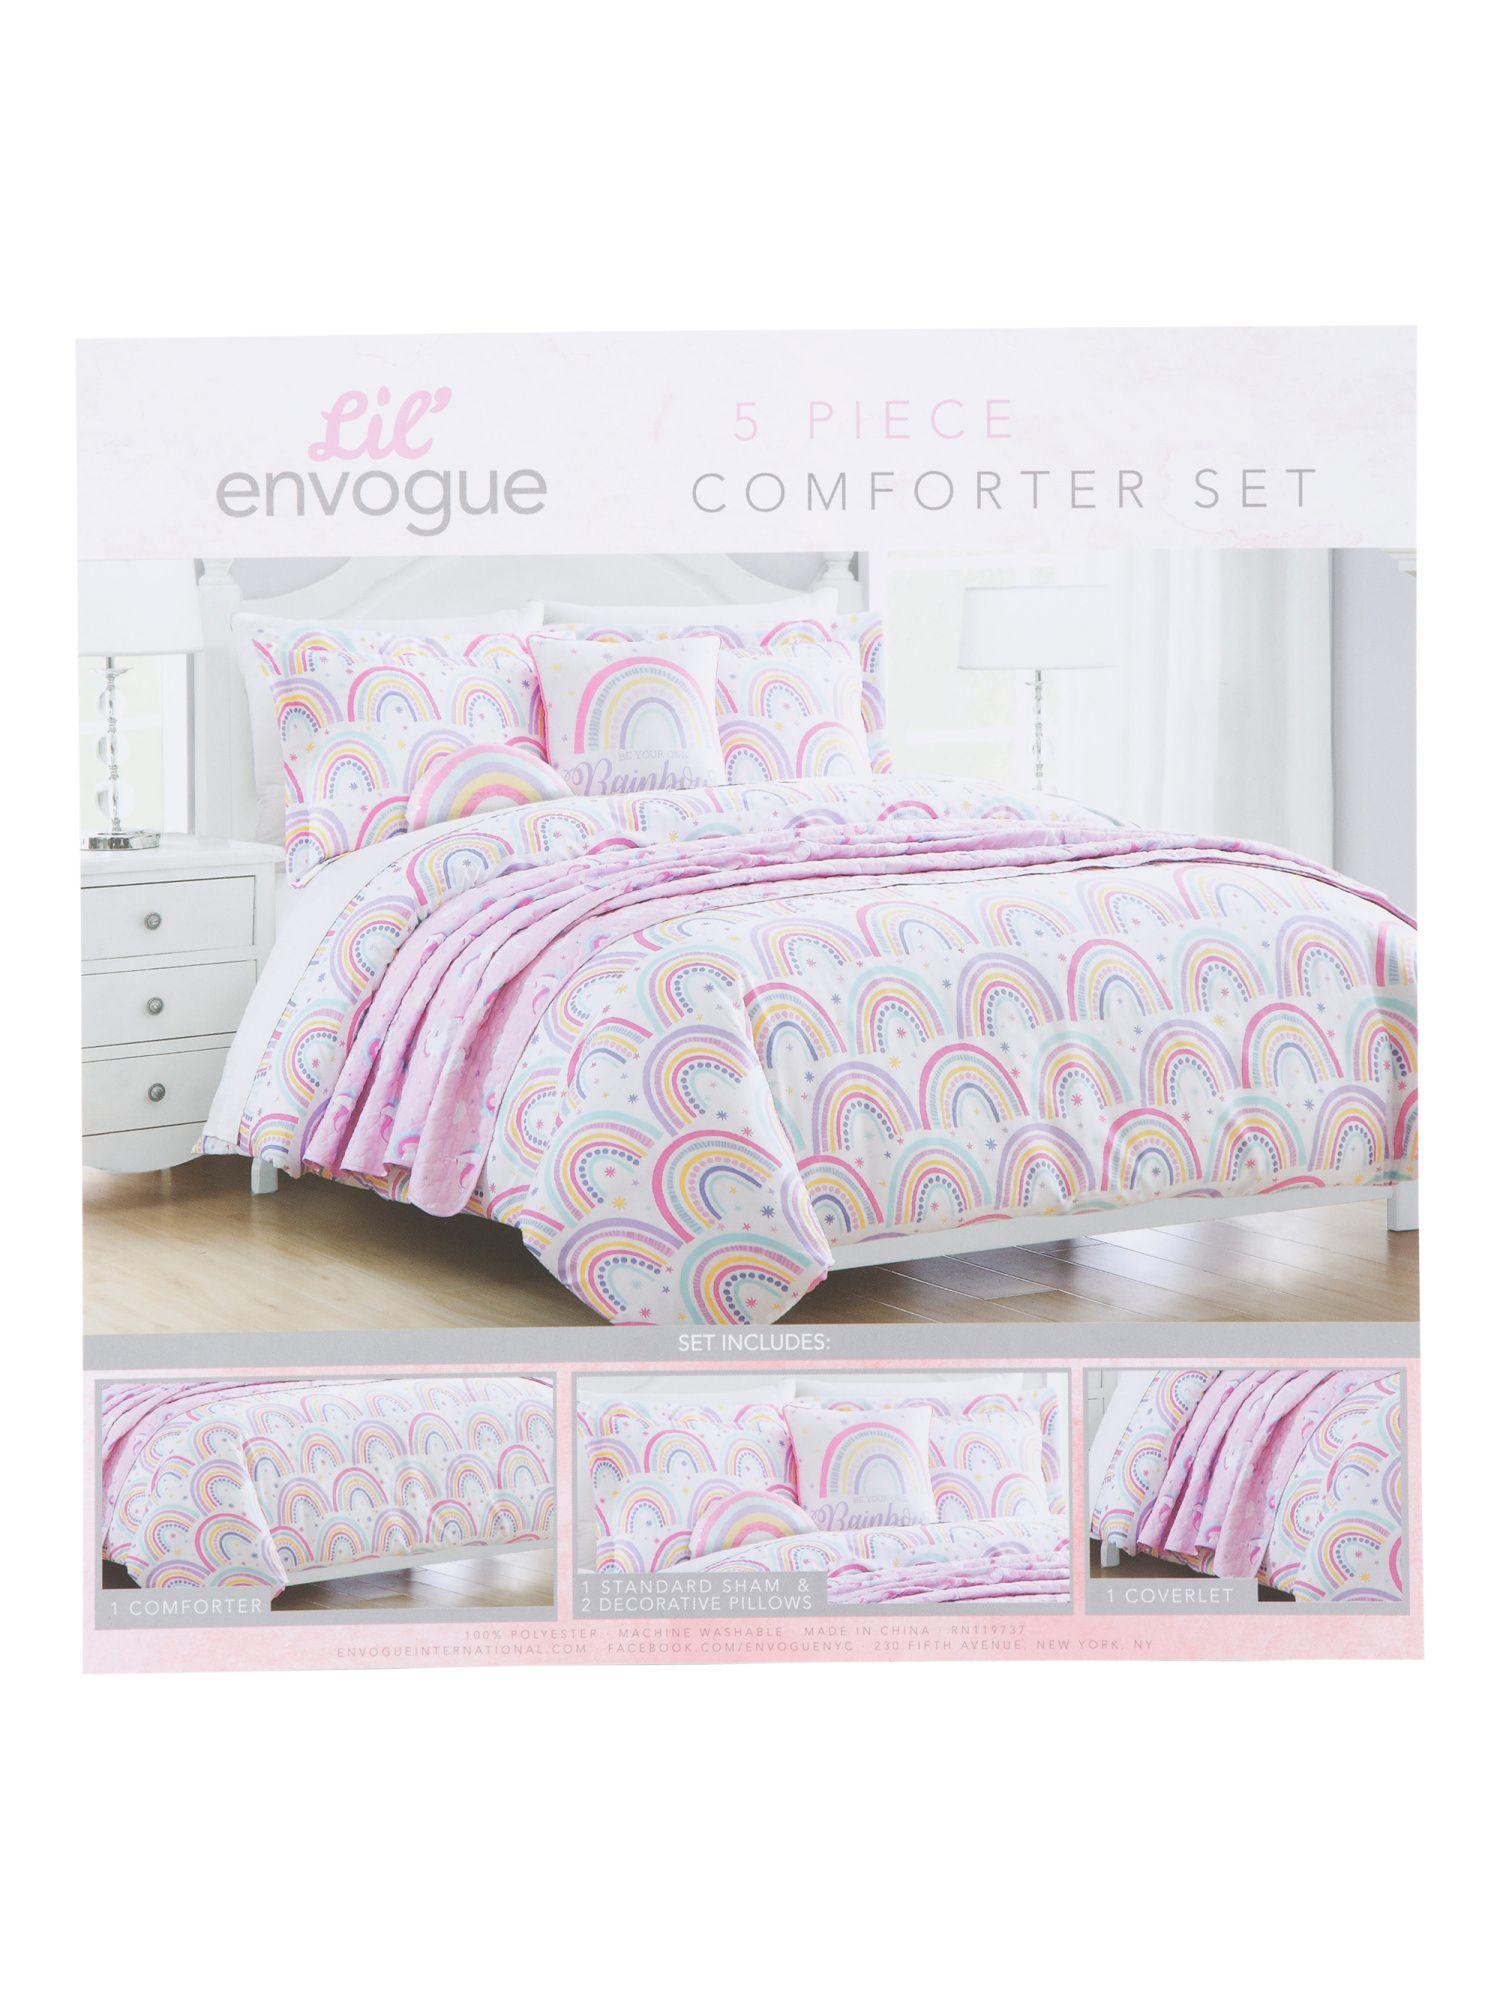 Over The Rainbow Comforter Set in 2020 Comforter sets